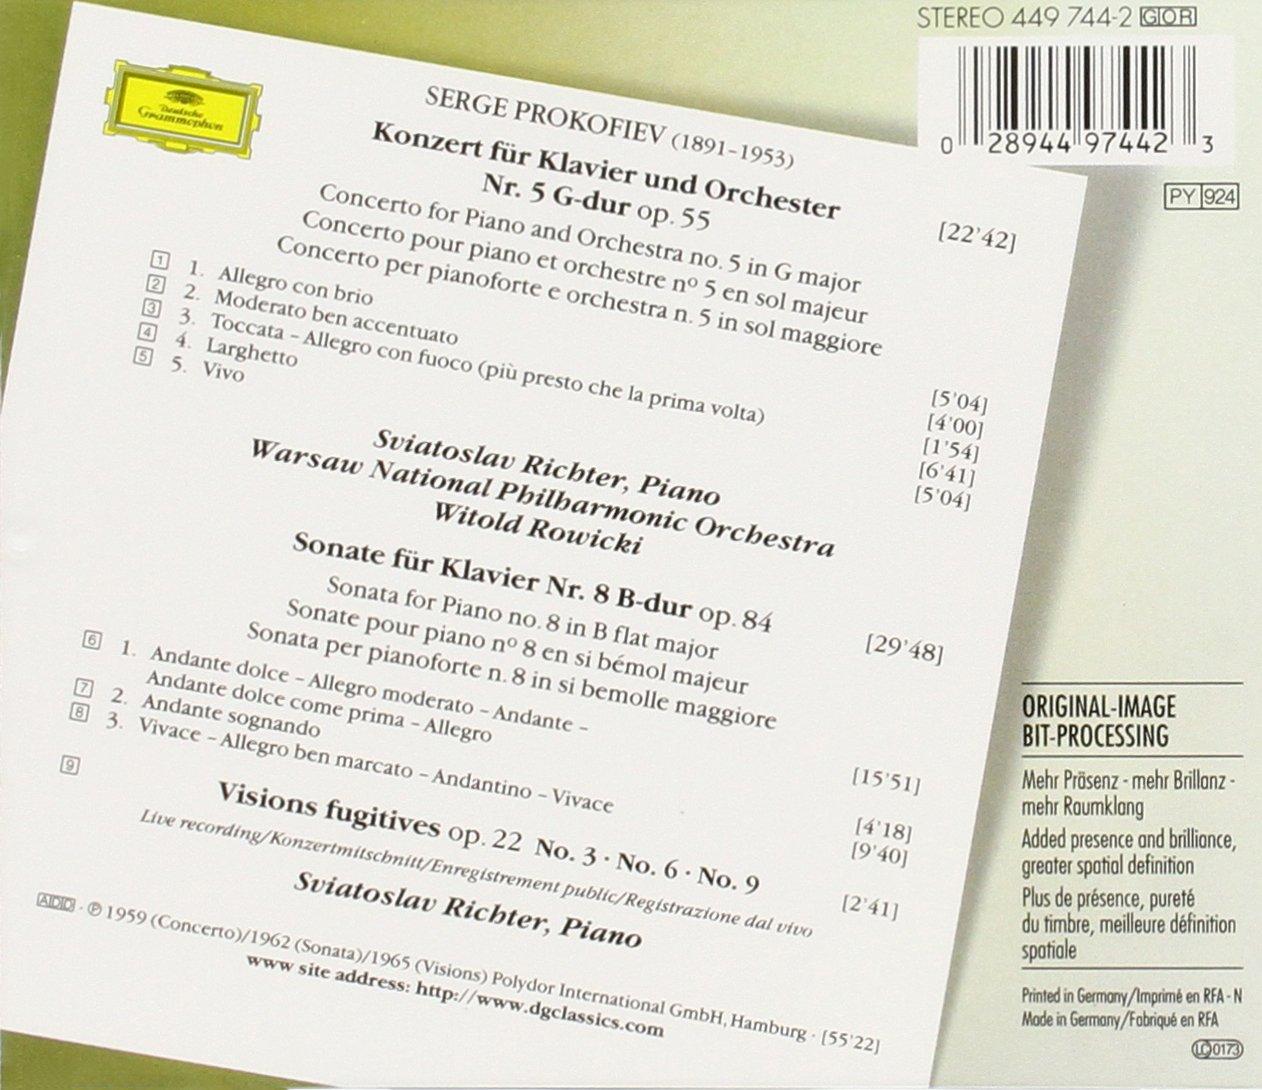 Sergei Prokofiev, Witold Rowicki, Warsaw National Philharmonic ...